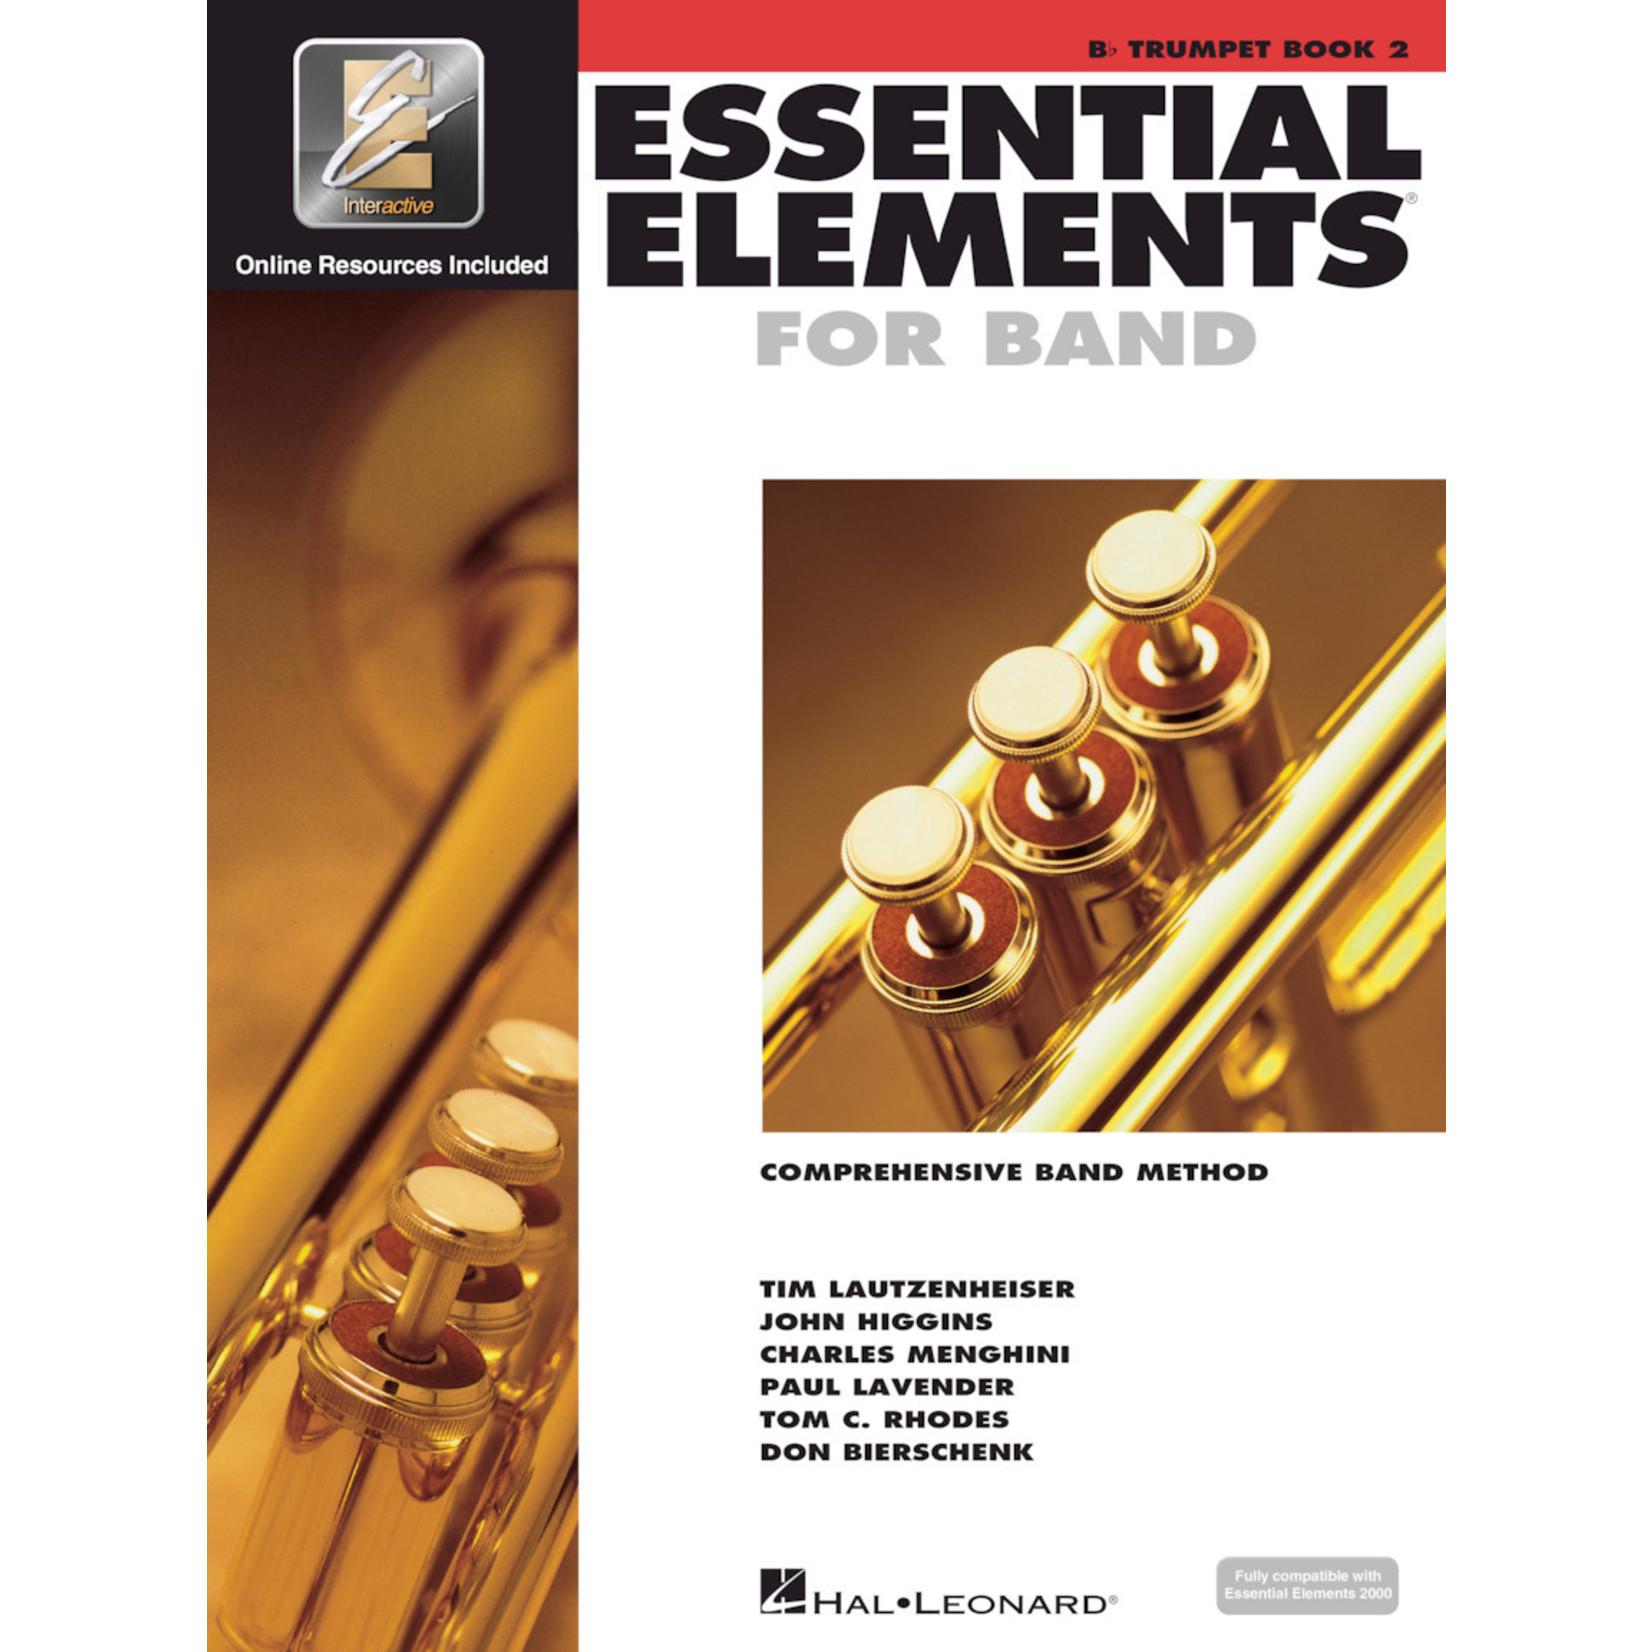 Hal Leonard Essential Elements for Band Trumpet Book 2